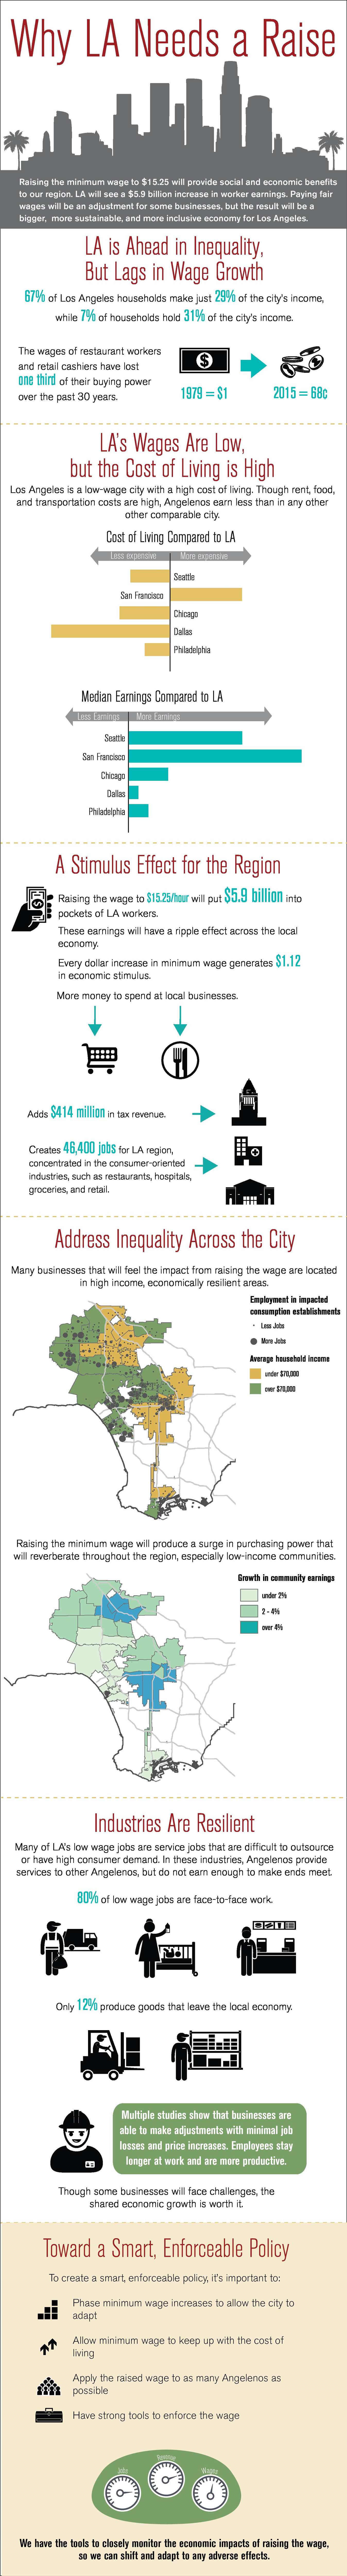 LA Rising infographic